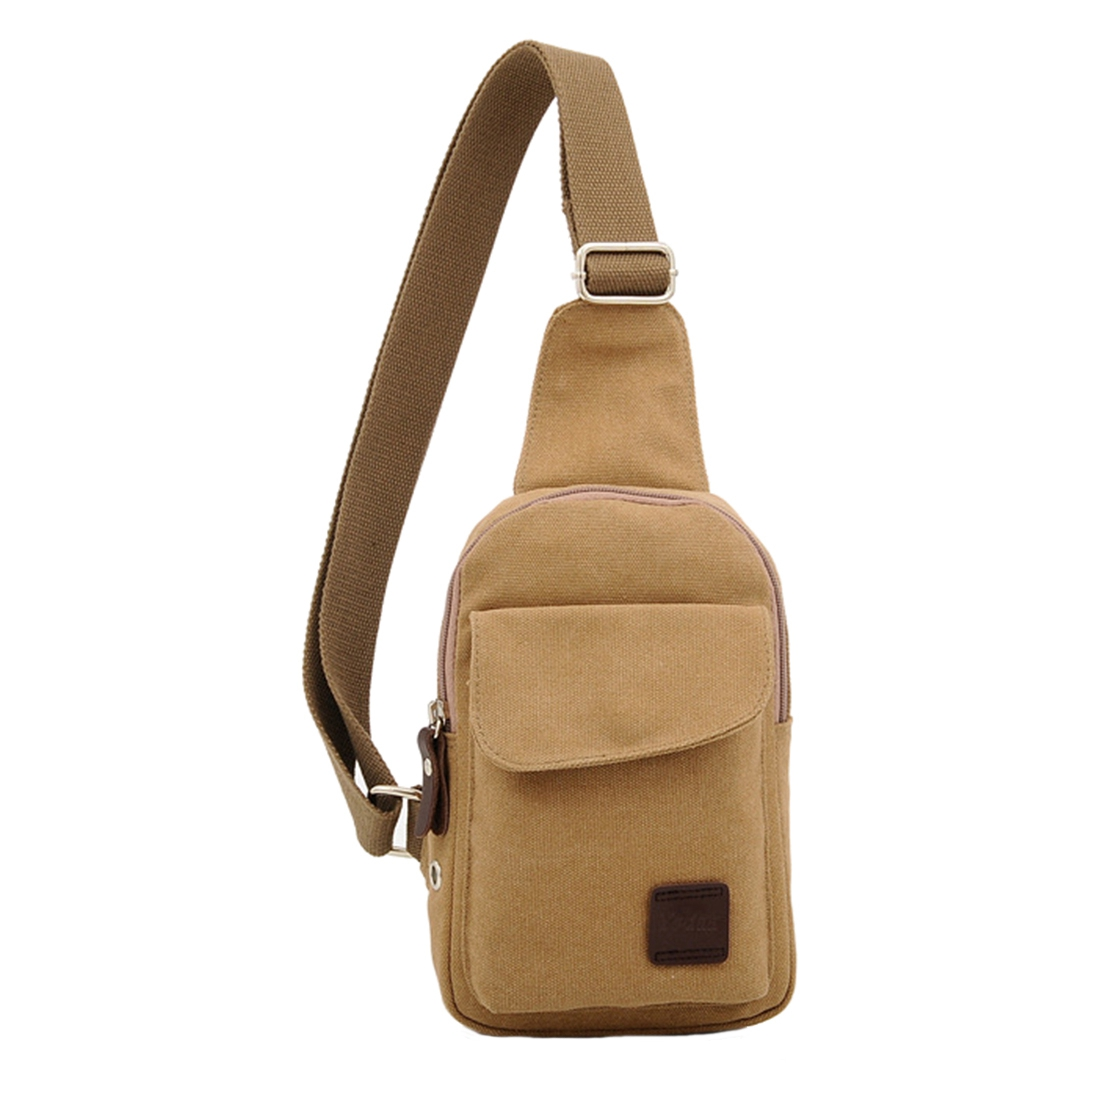 Hot Fashion Canvas Men bag Satchel Casual Cross Body Shoulder Bag Vintage vintage men canvas satchel casual cross body messenger shoulder bag coffee